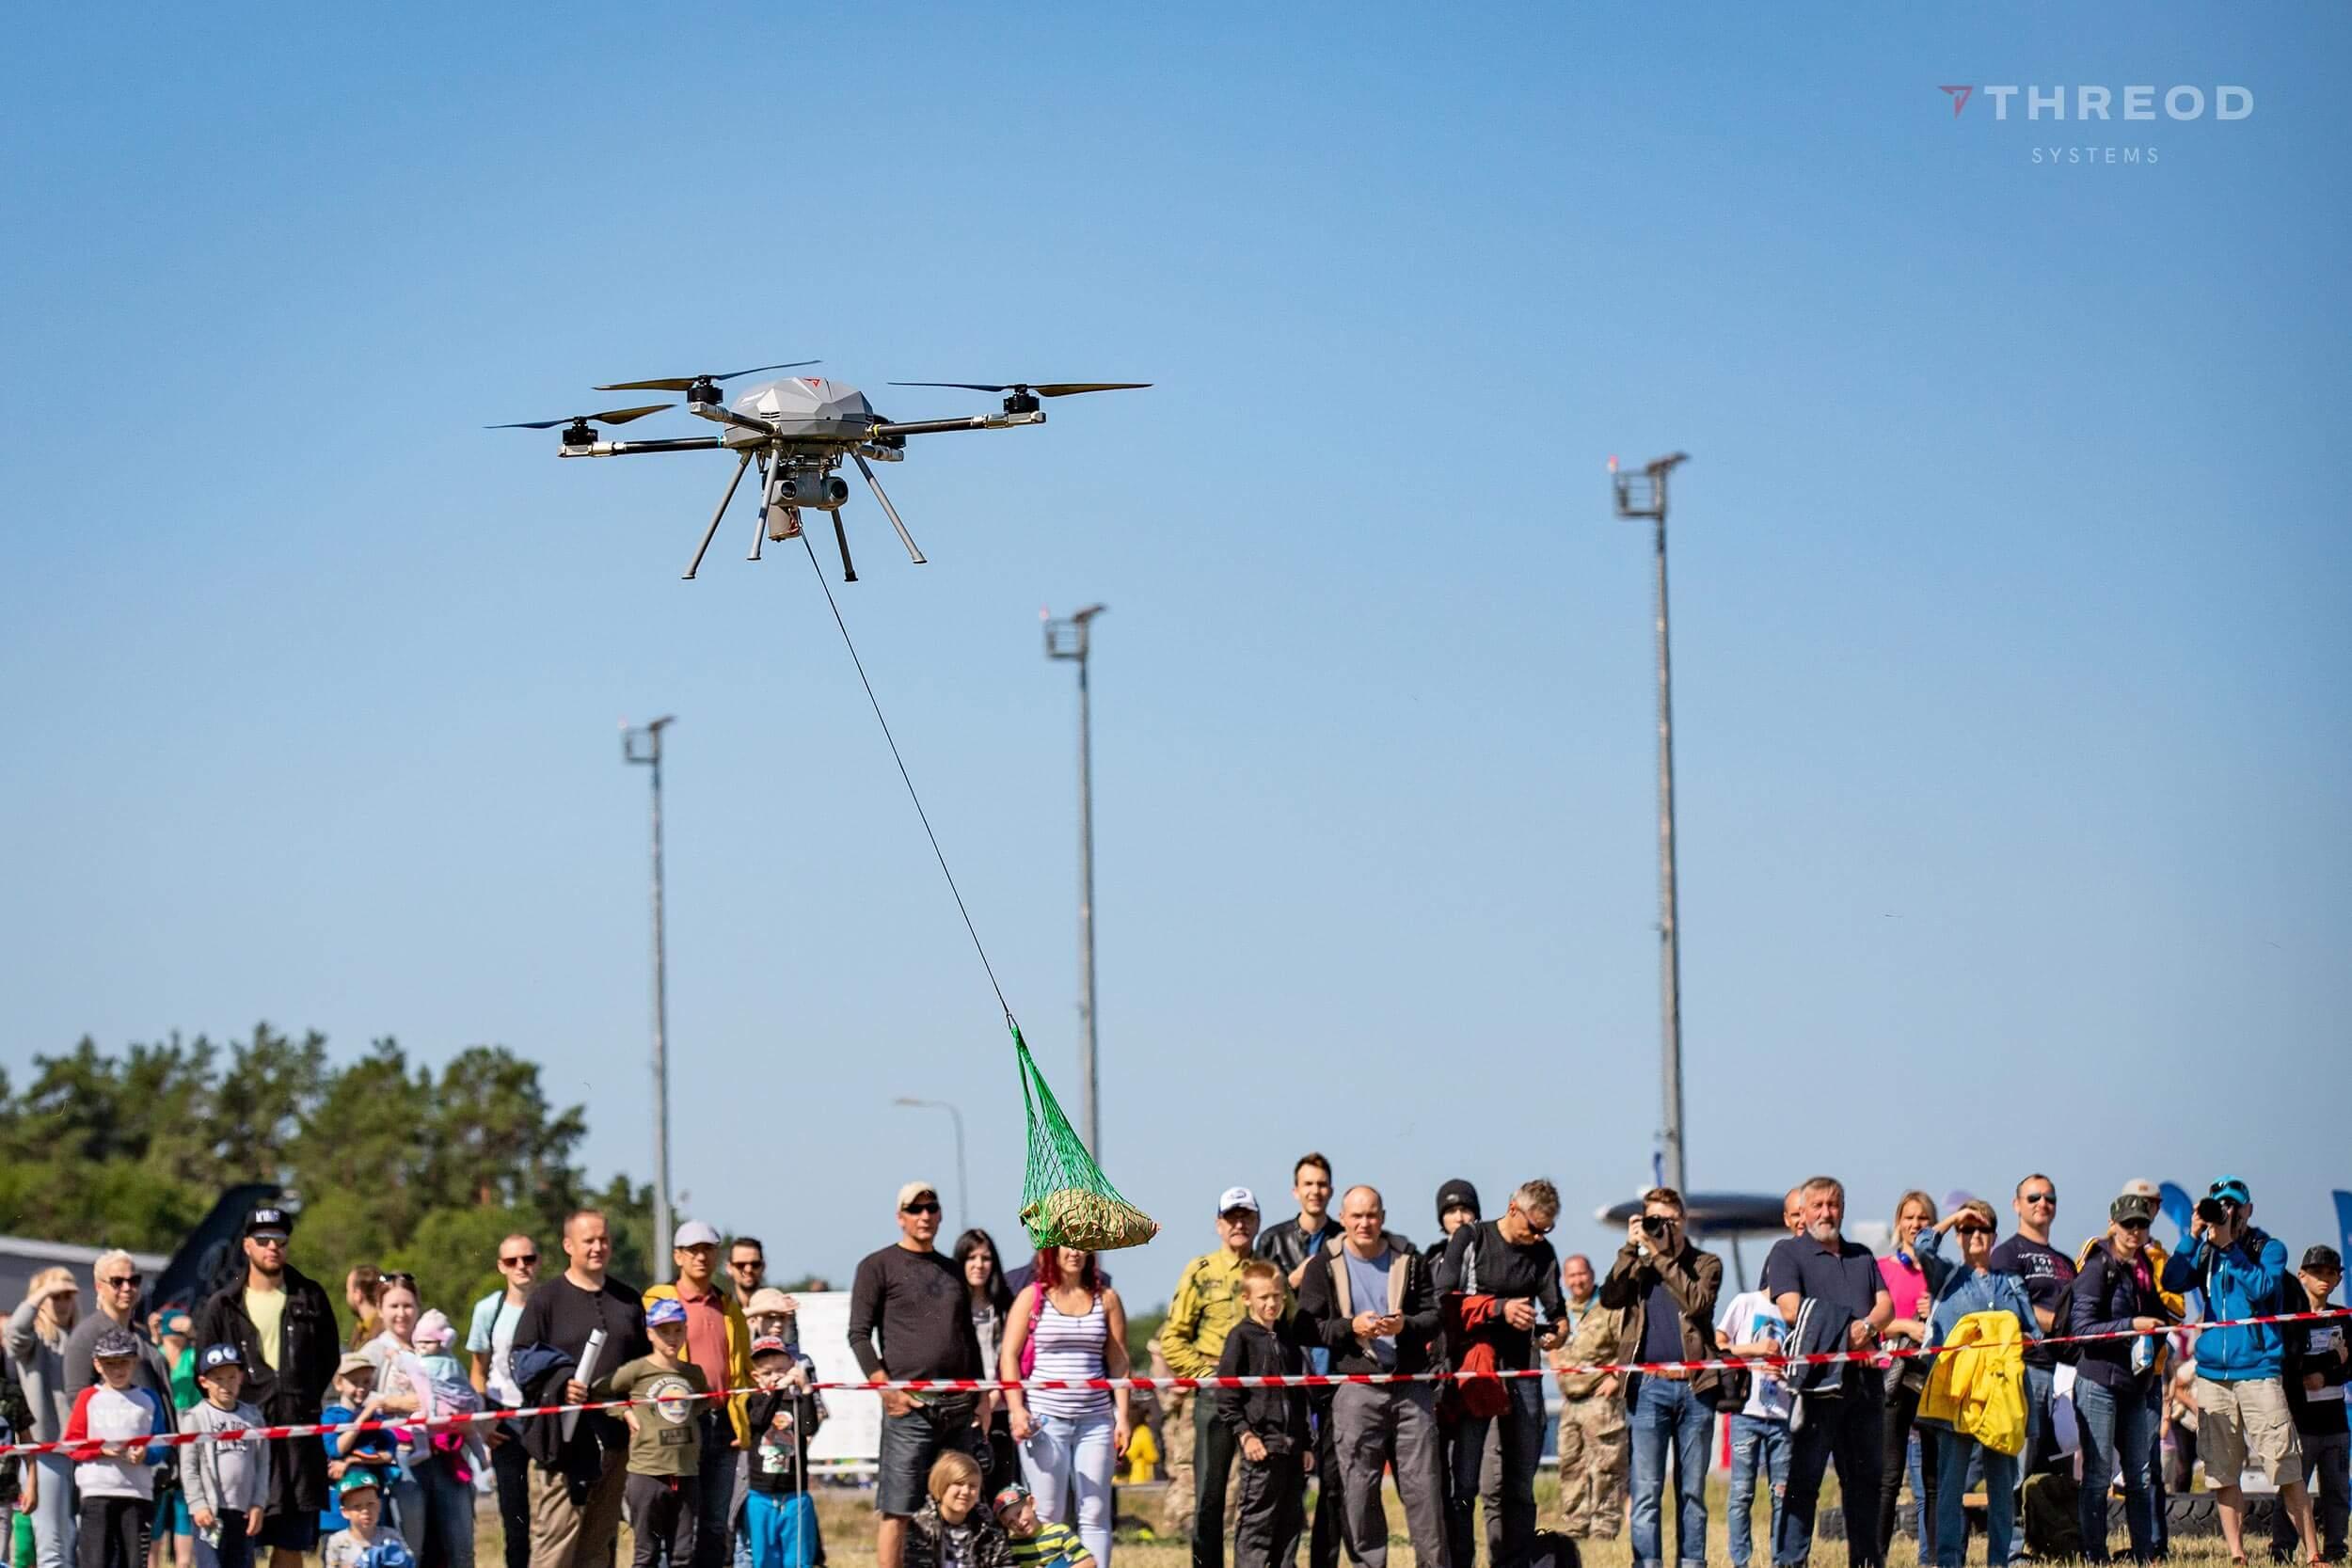 Titan drone at Ämari air show